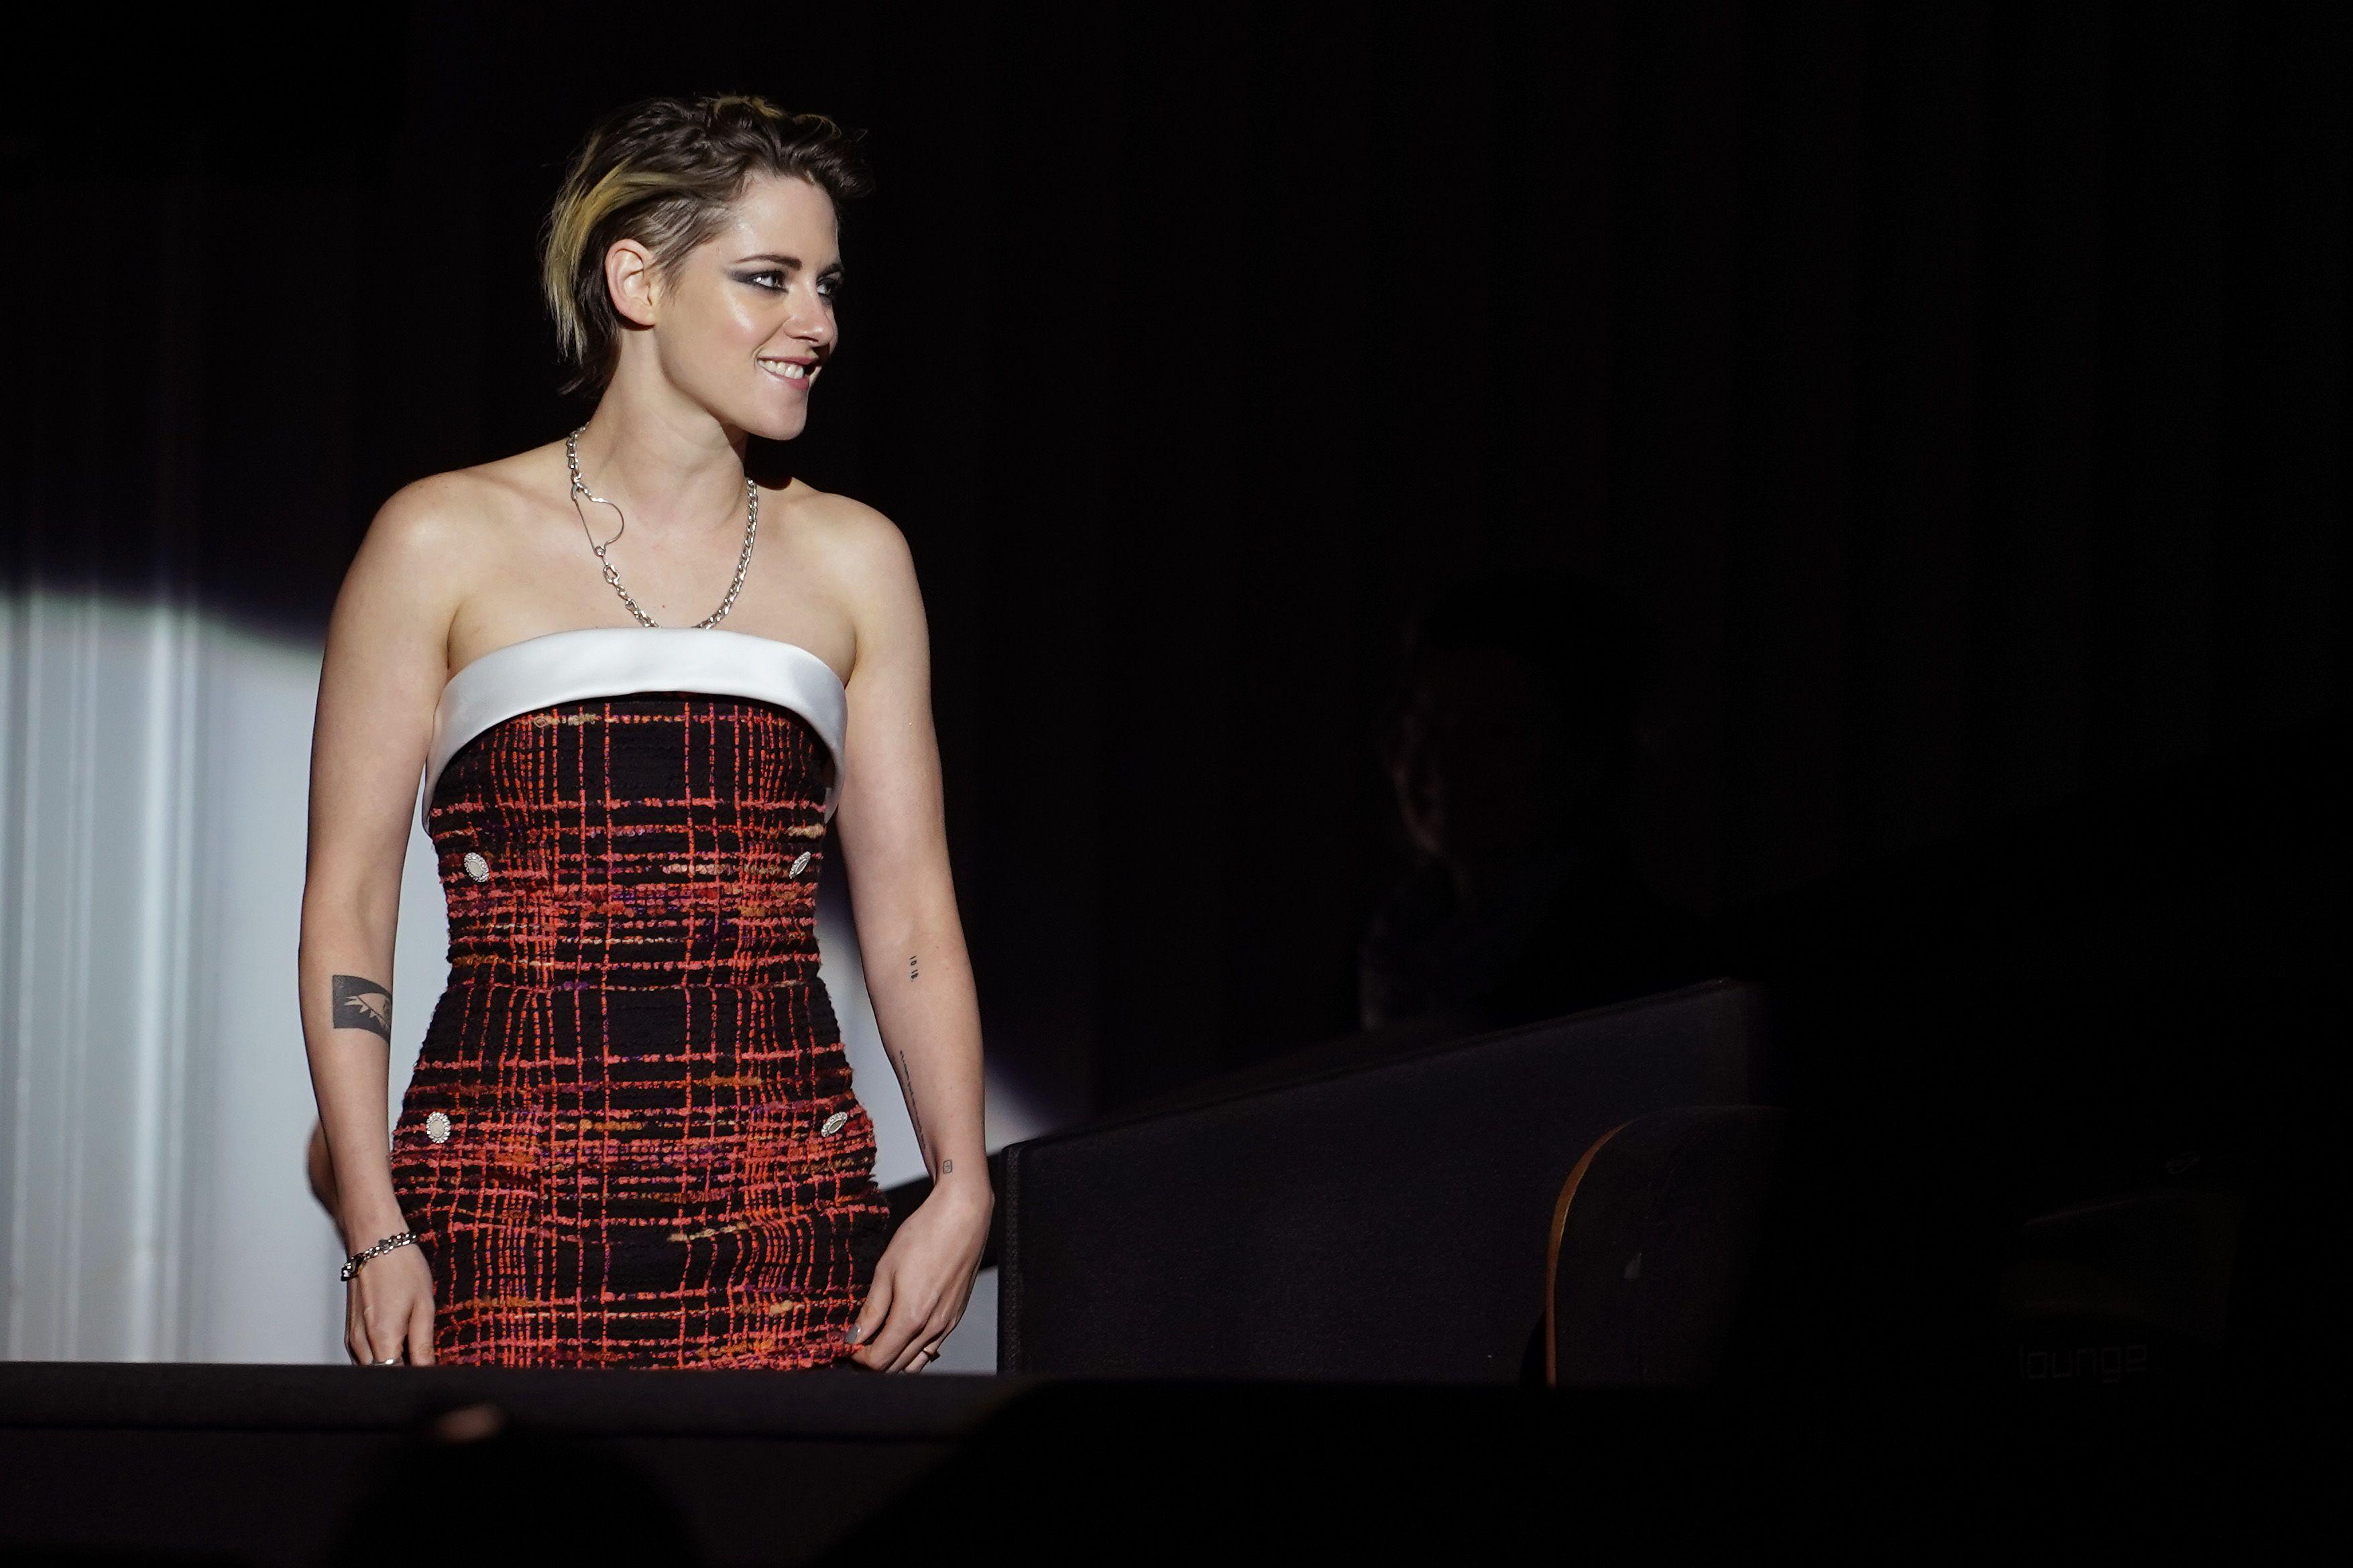 Kristen Stewart wears tweed Chanel couture to the Seberg premiere